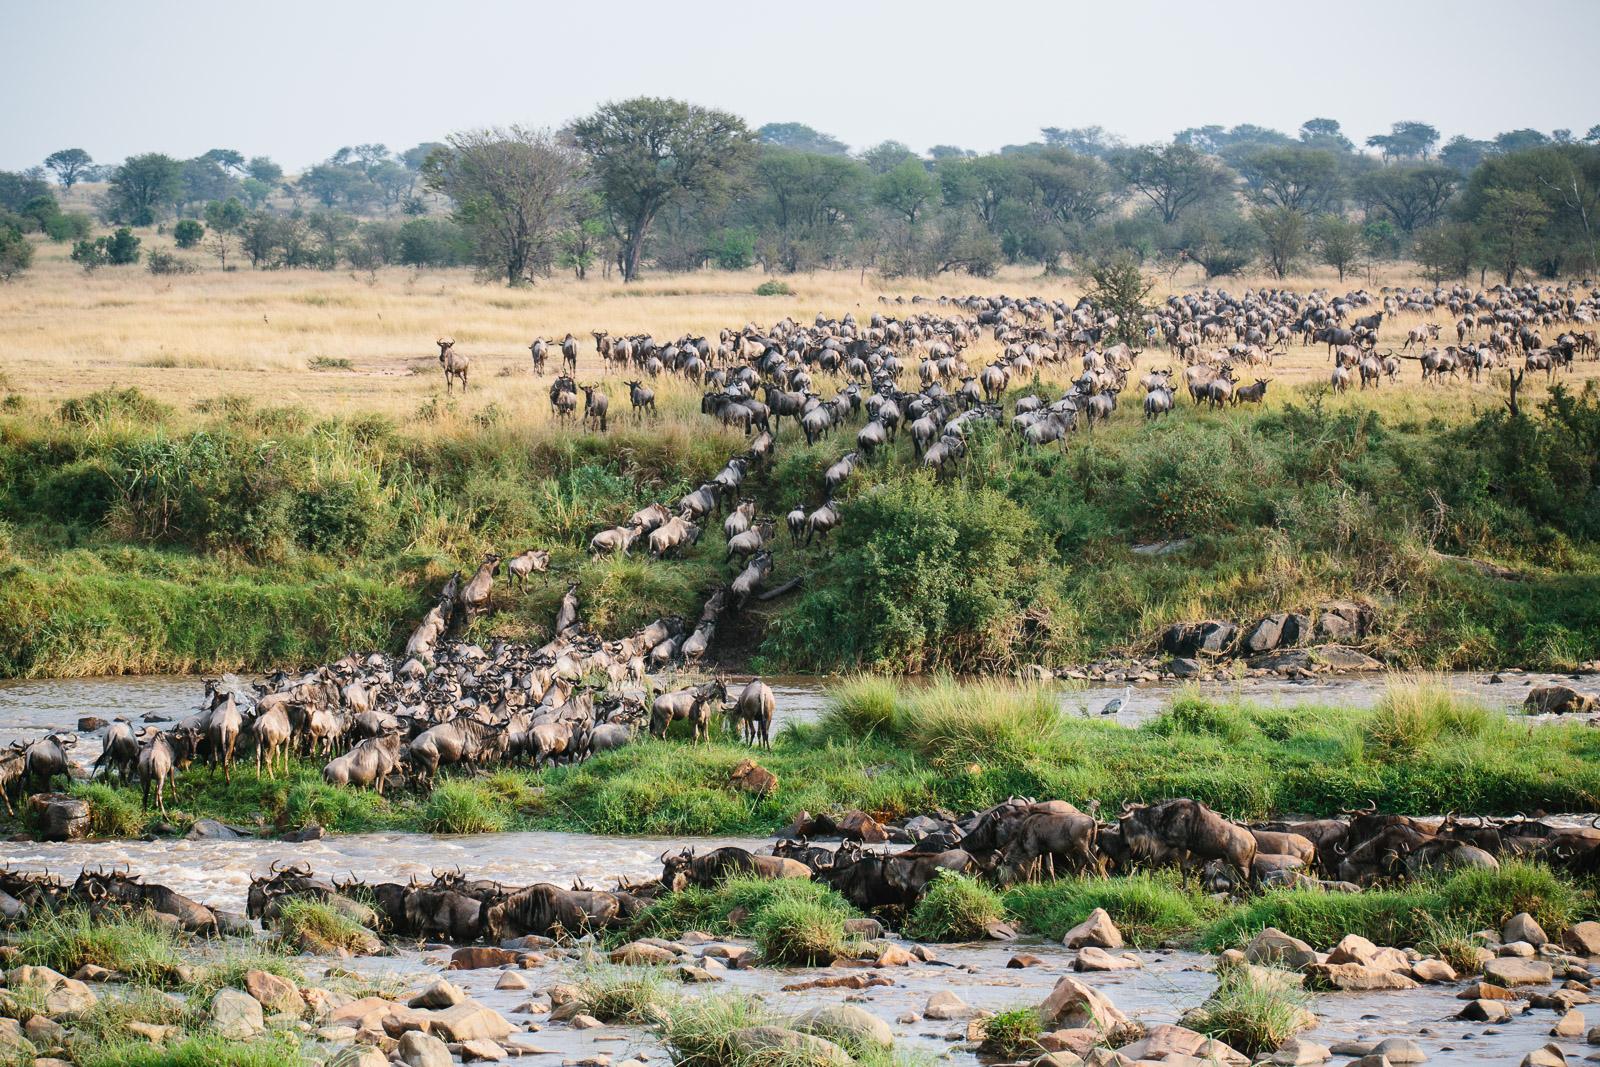 tanzania-africa-travel-photos-adventure-safari-1.jpg